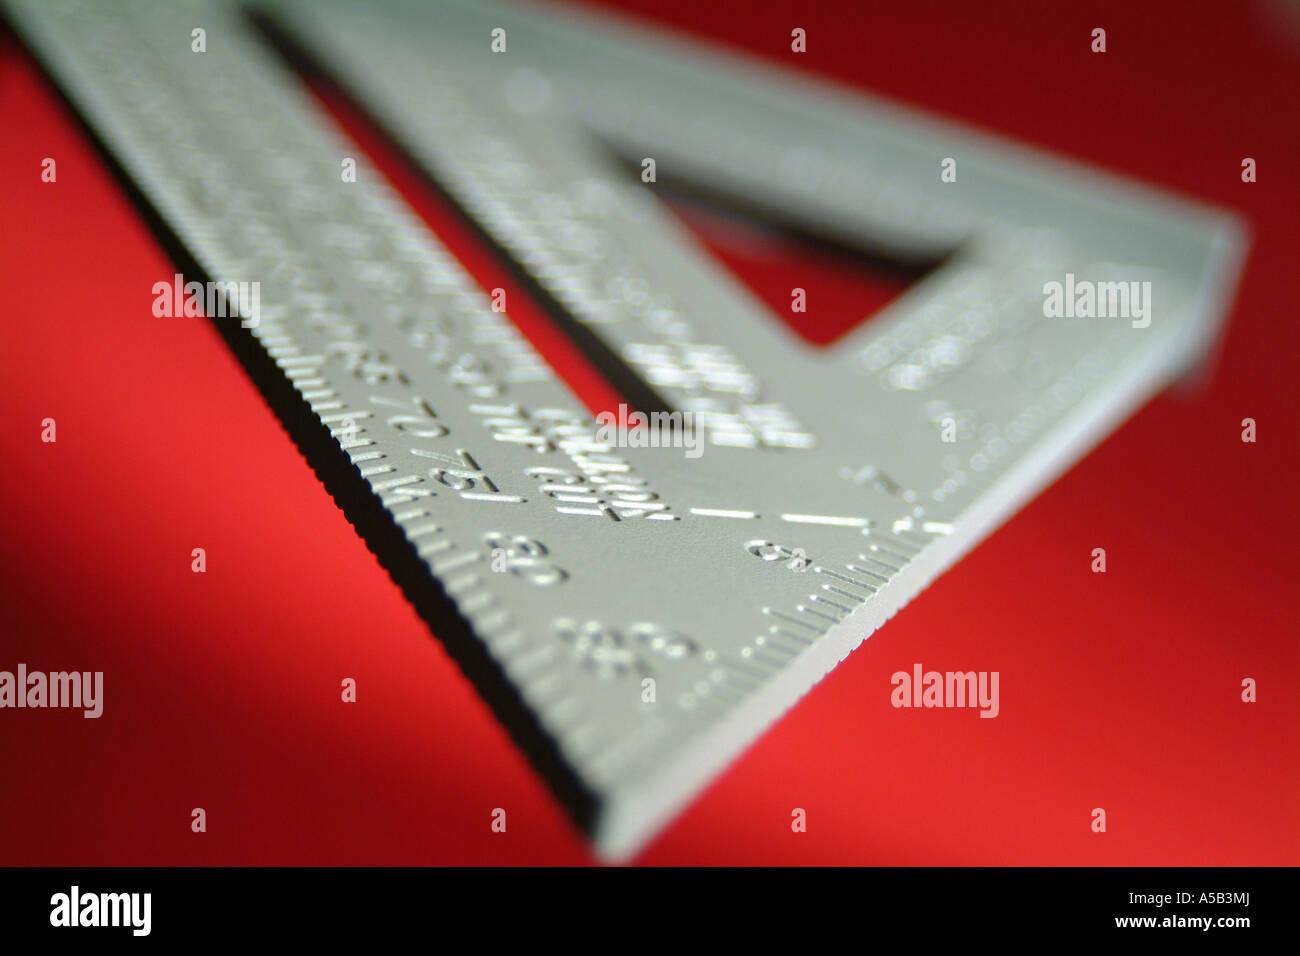 Triangular measuring tool. - Stock Image